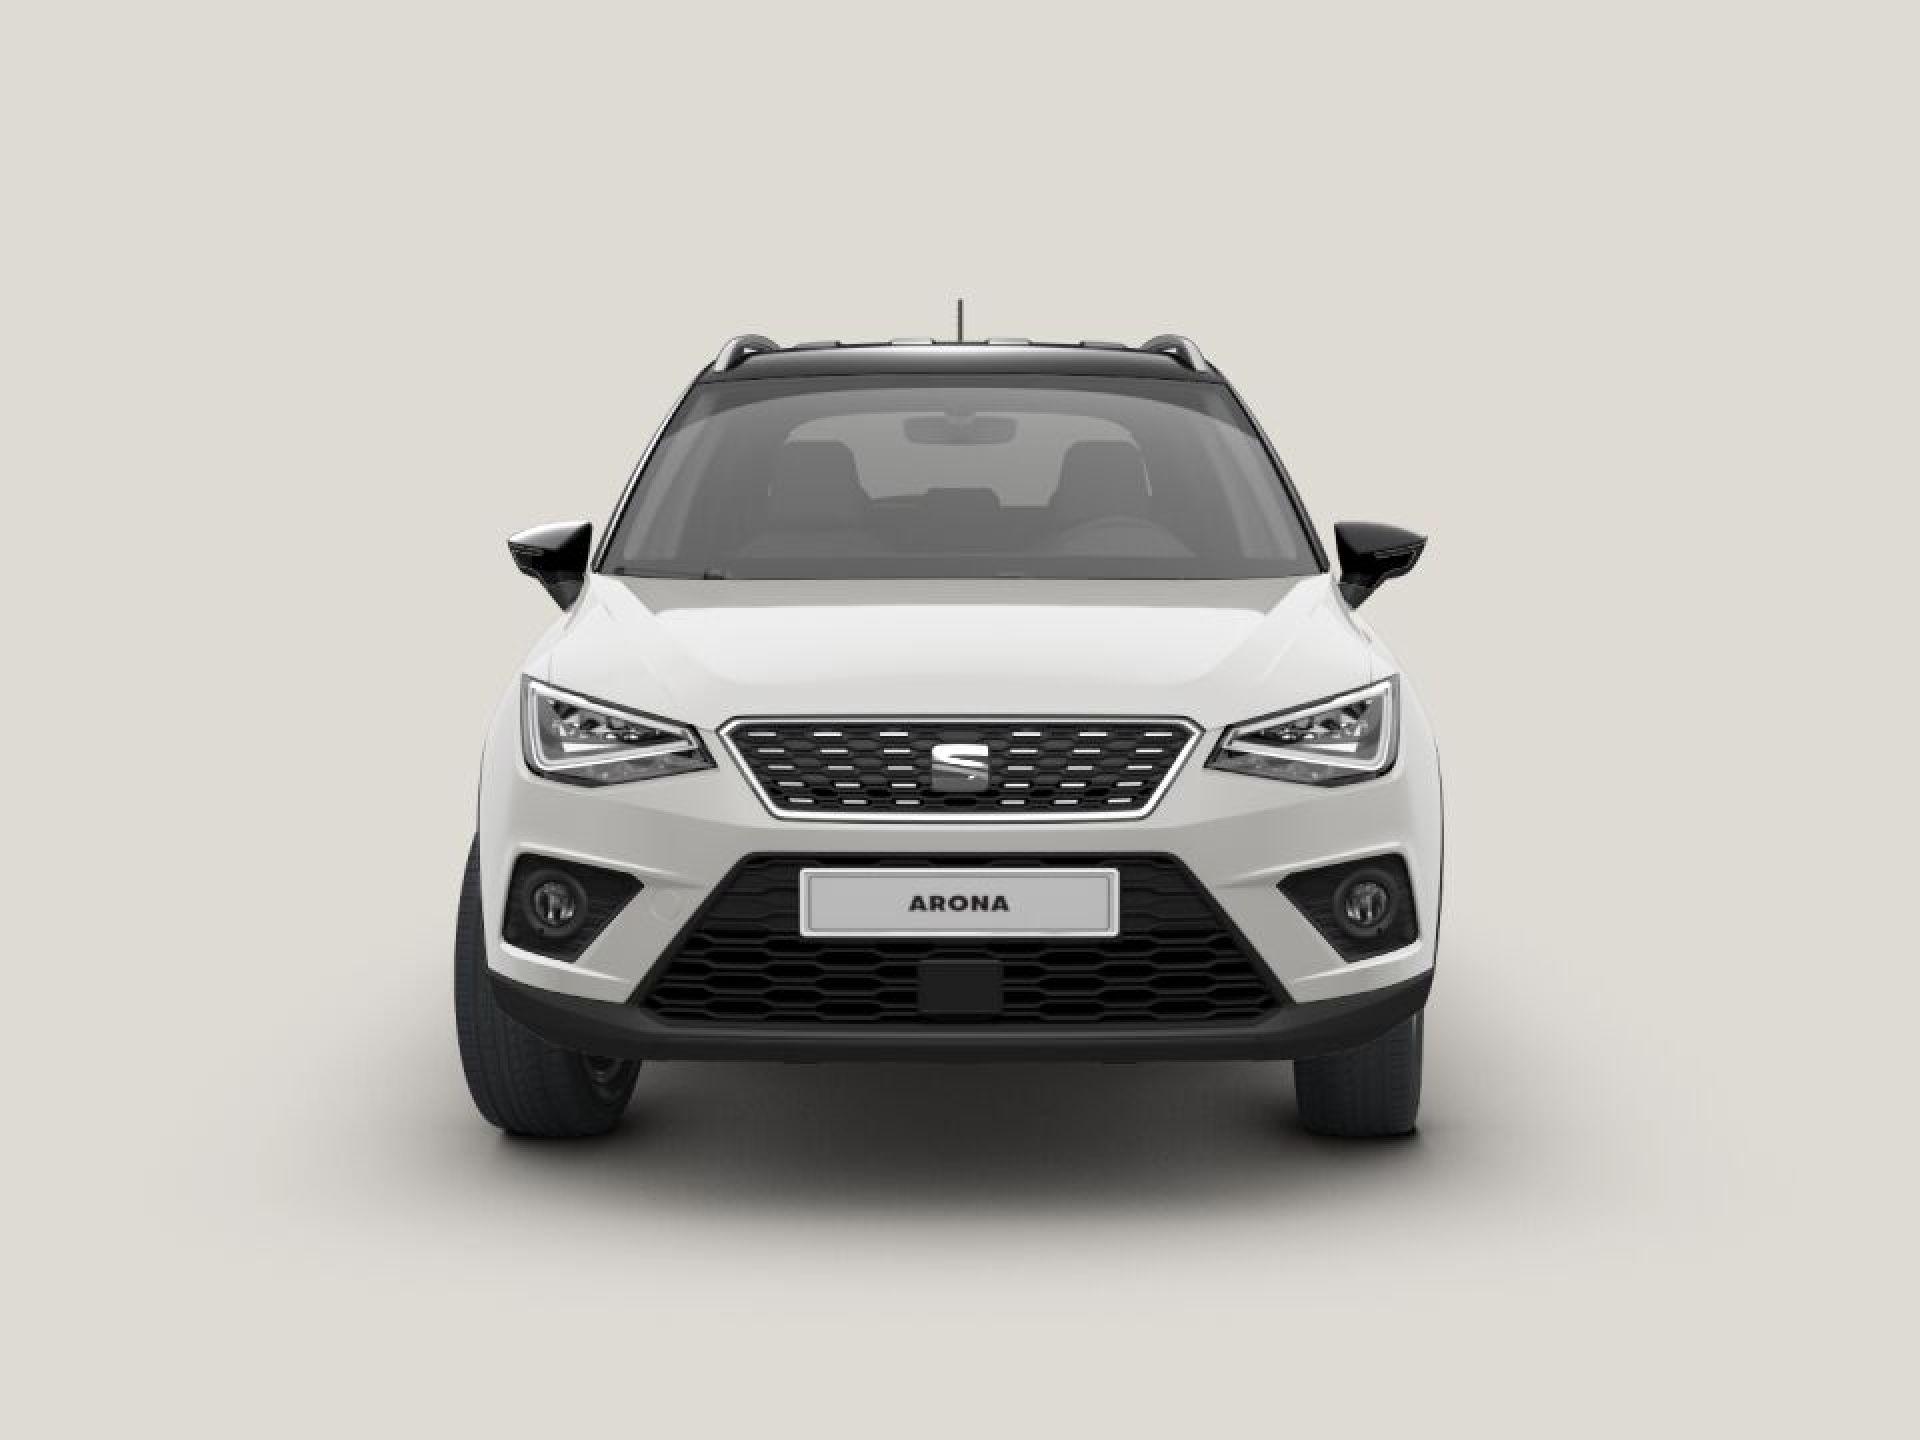 SEAT Arona 1.0 TSI 85kW DSG Xcellence Go Eco nuevo Madrid